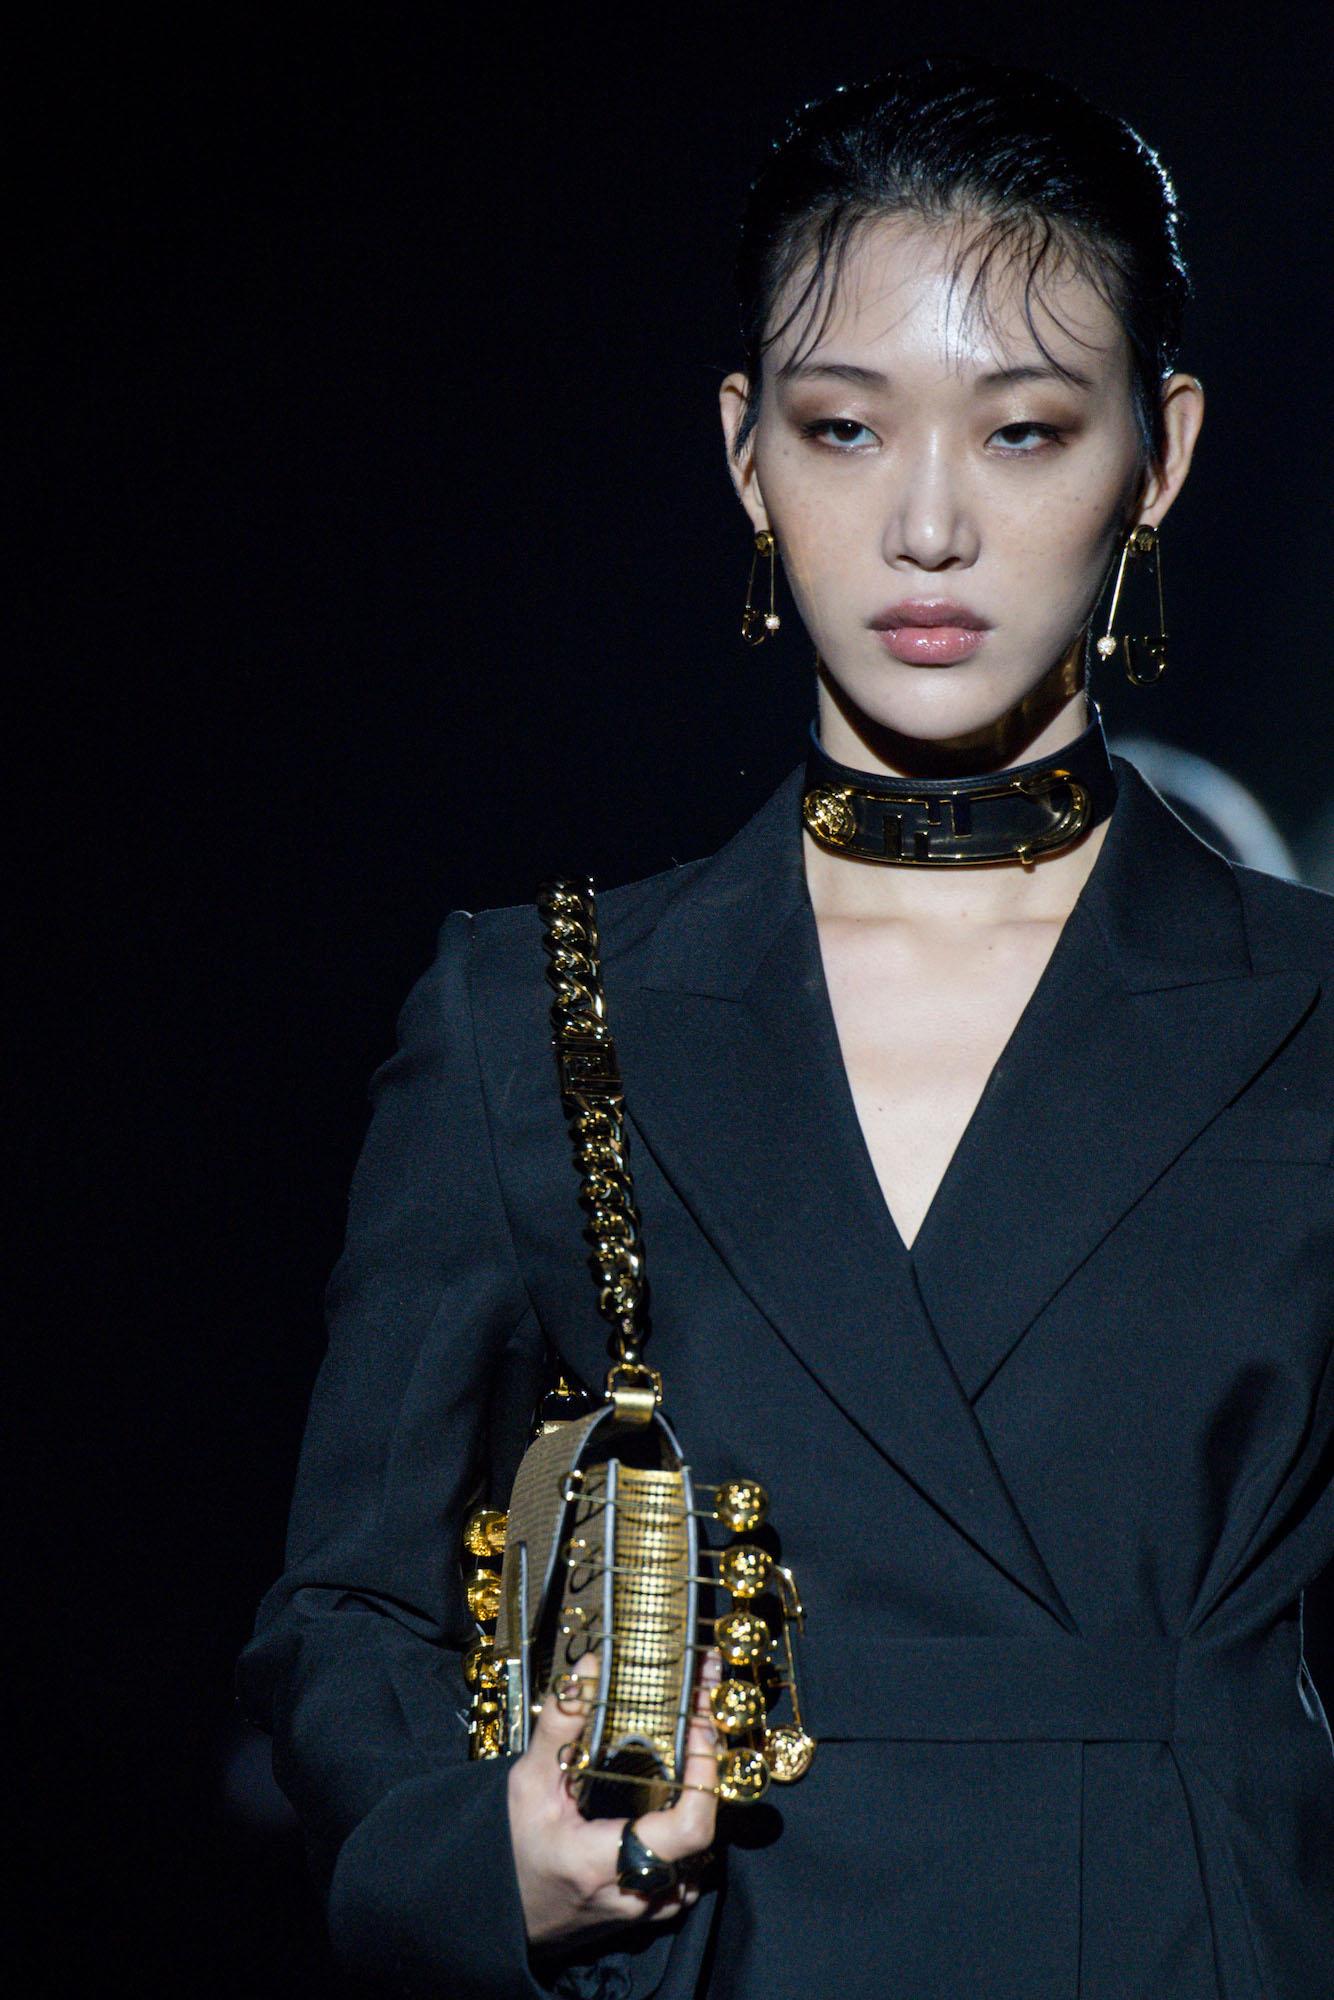 versace by fendi details (4)